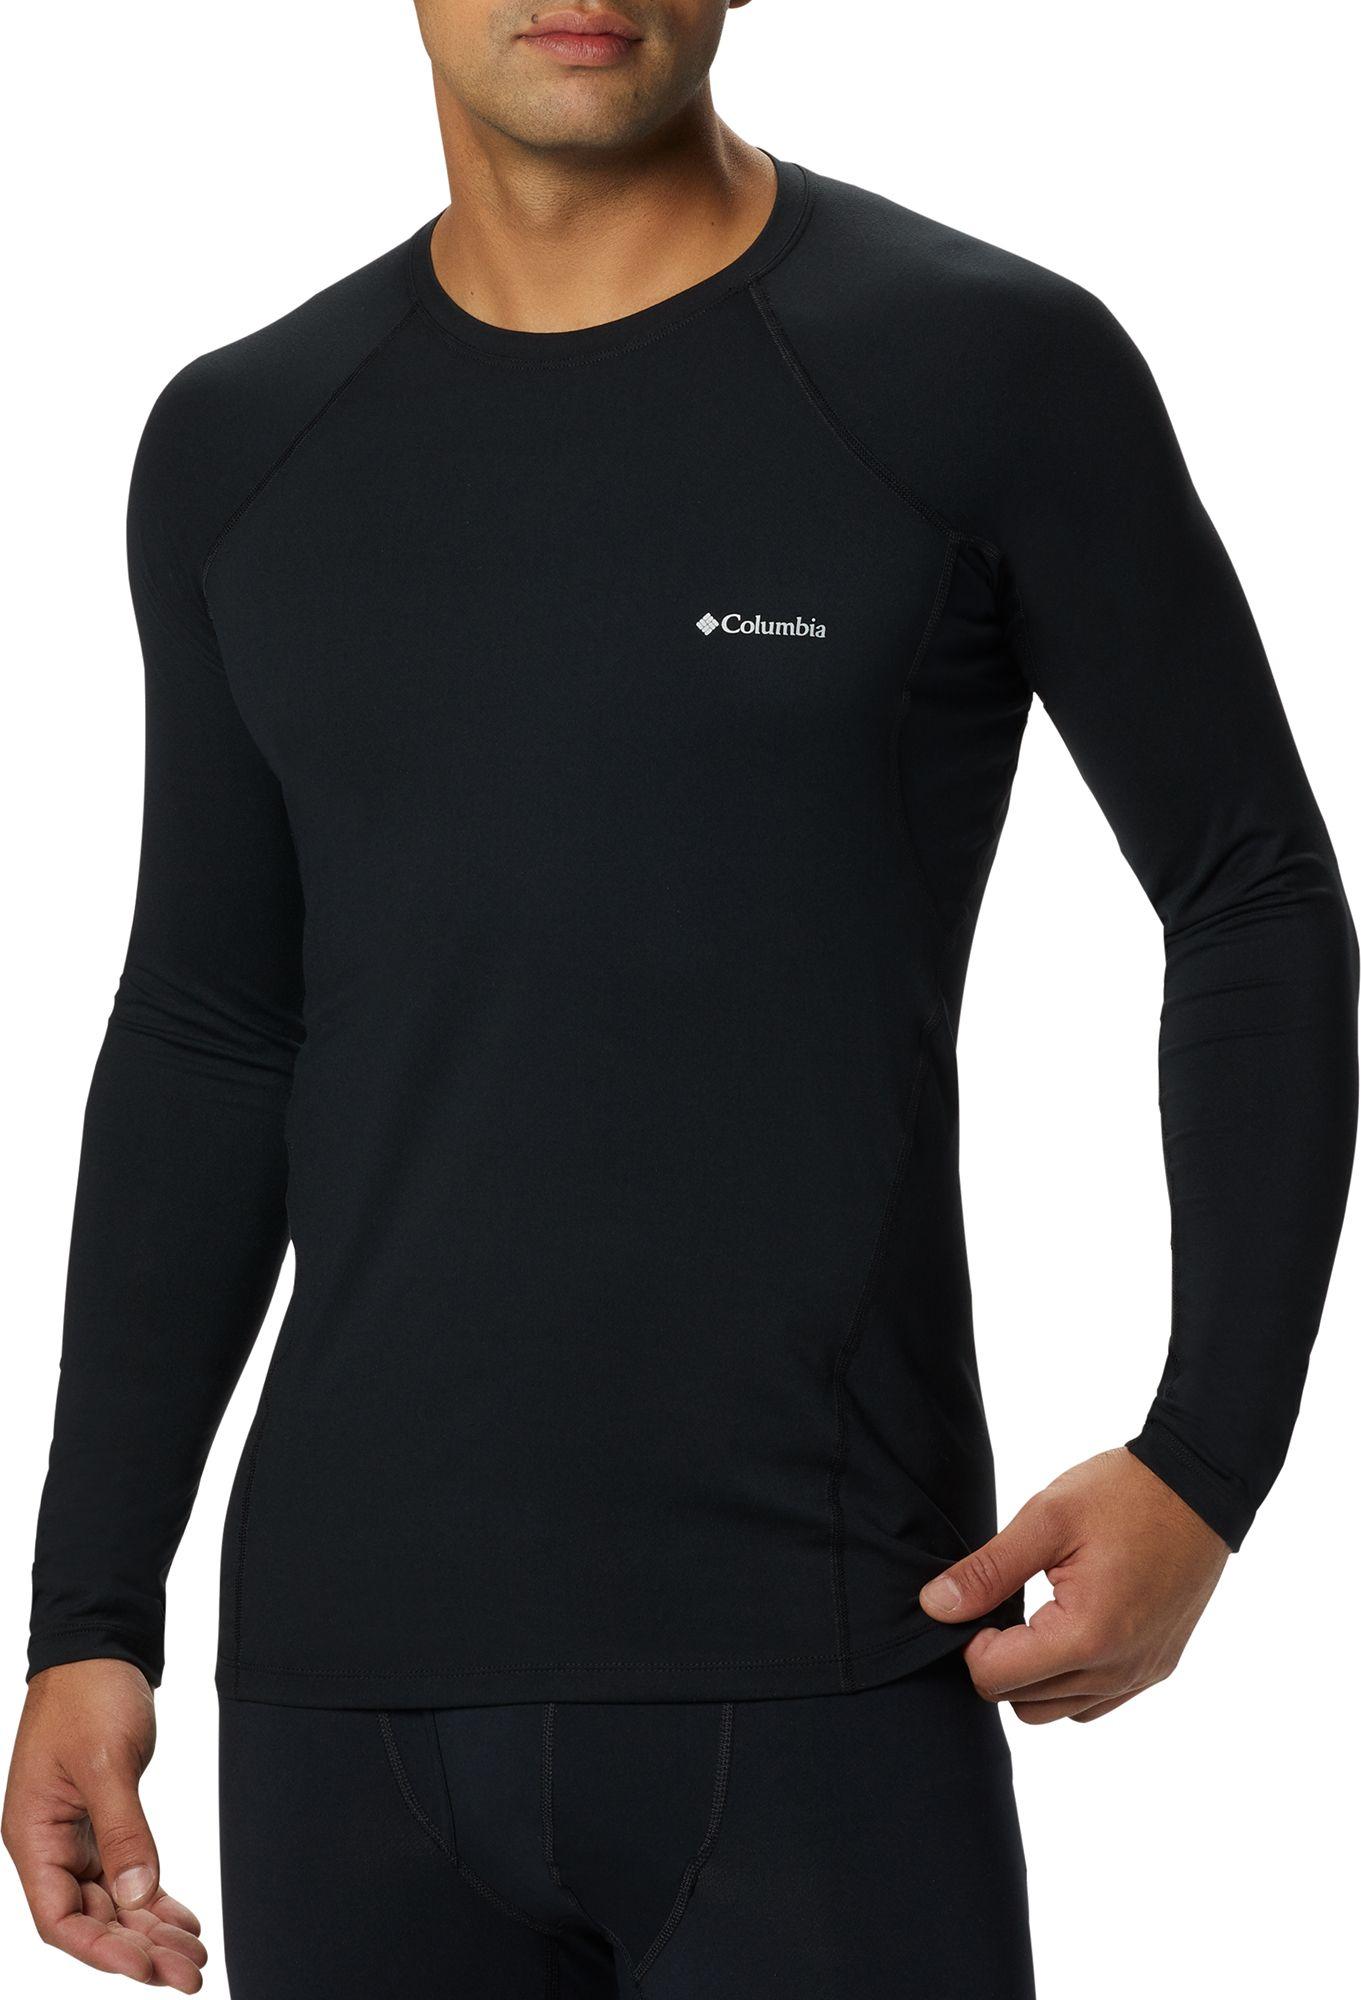 Columbia Men's Midweight Stretch Base Layer Long Sleeve Shirt. 0:00. 0:00 /  0:00. noImageFound ???